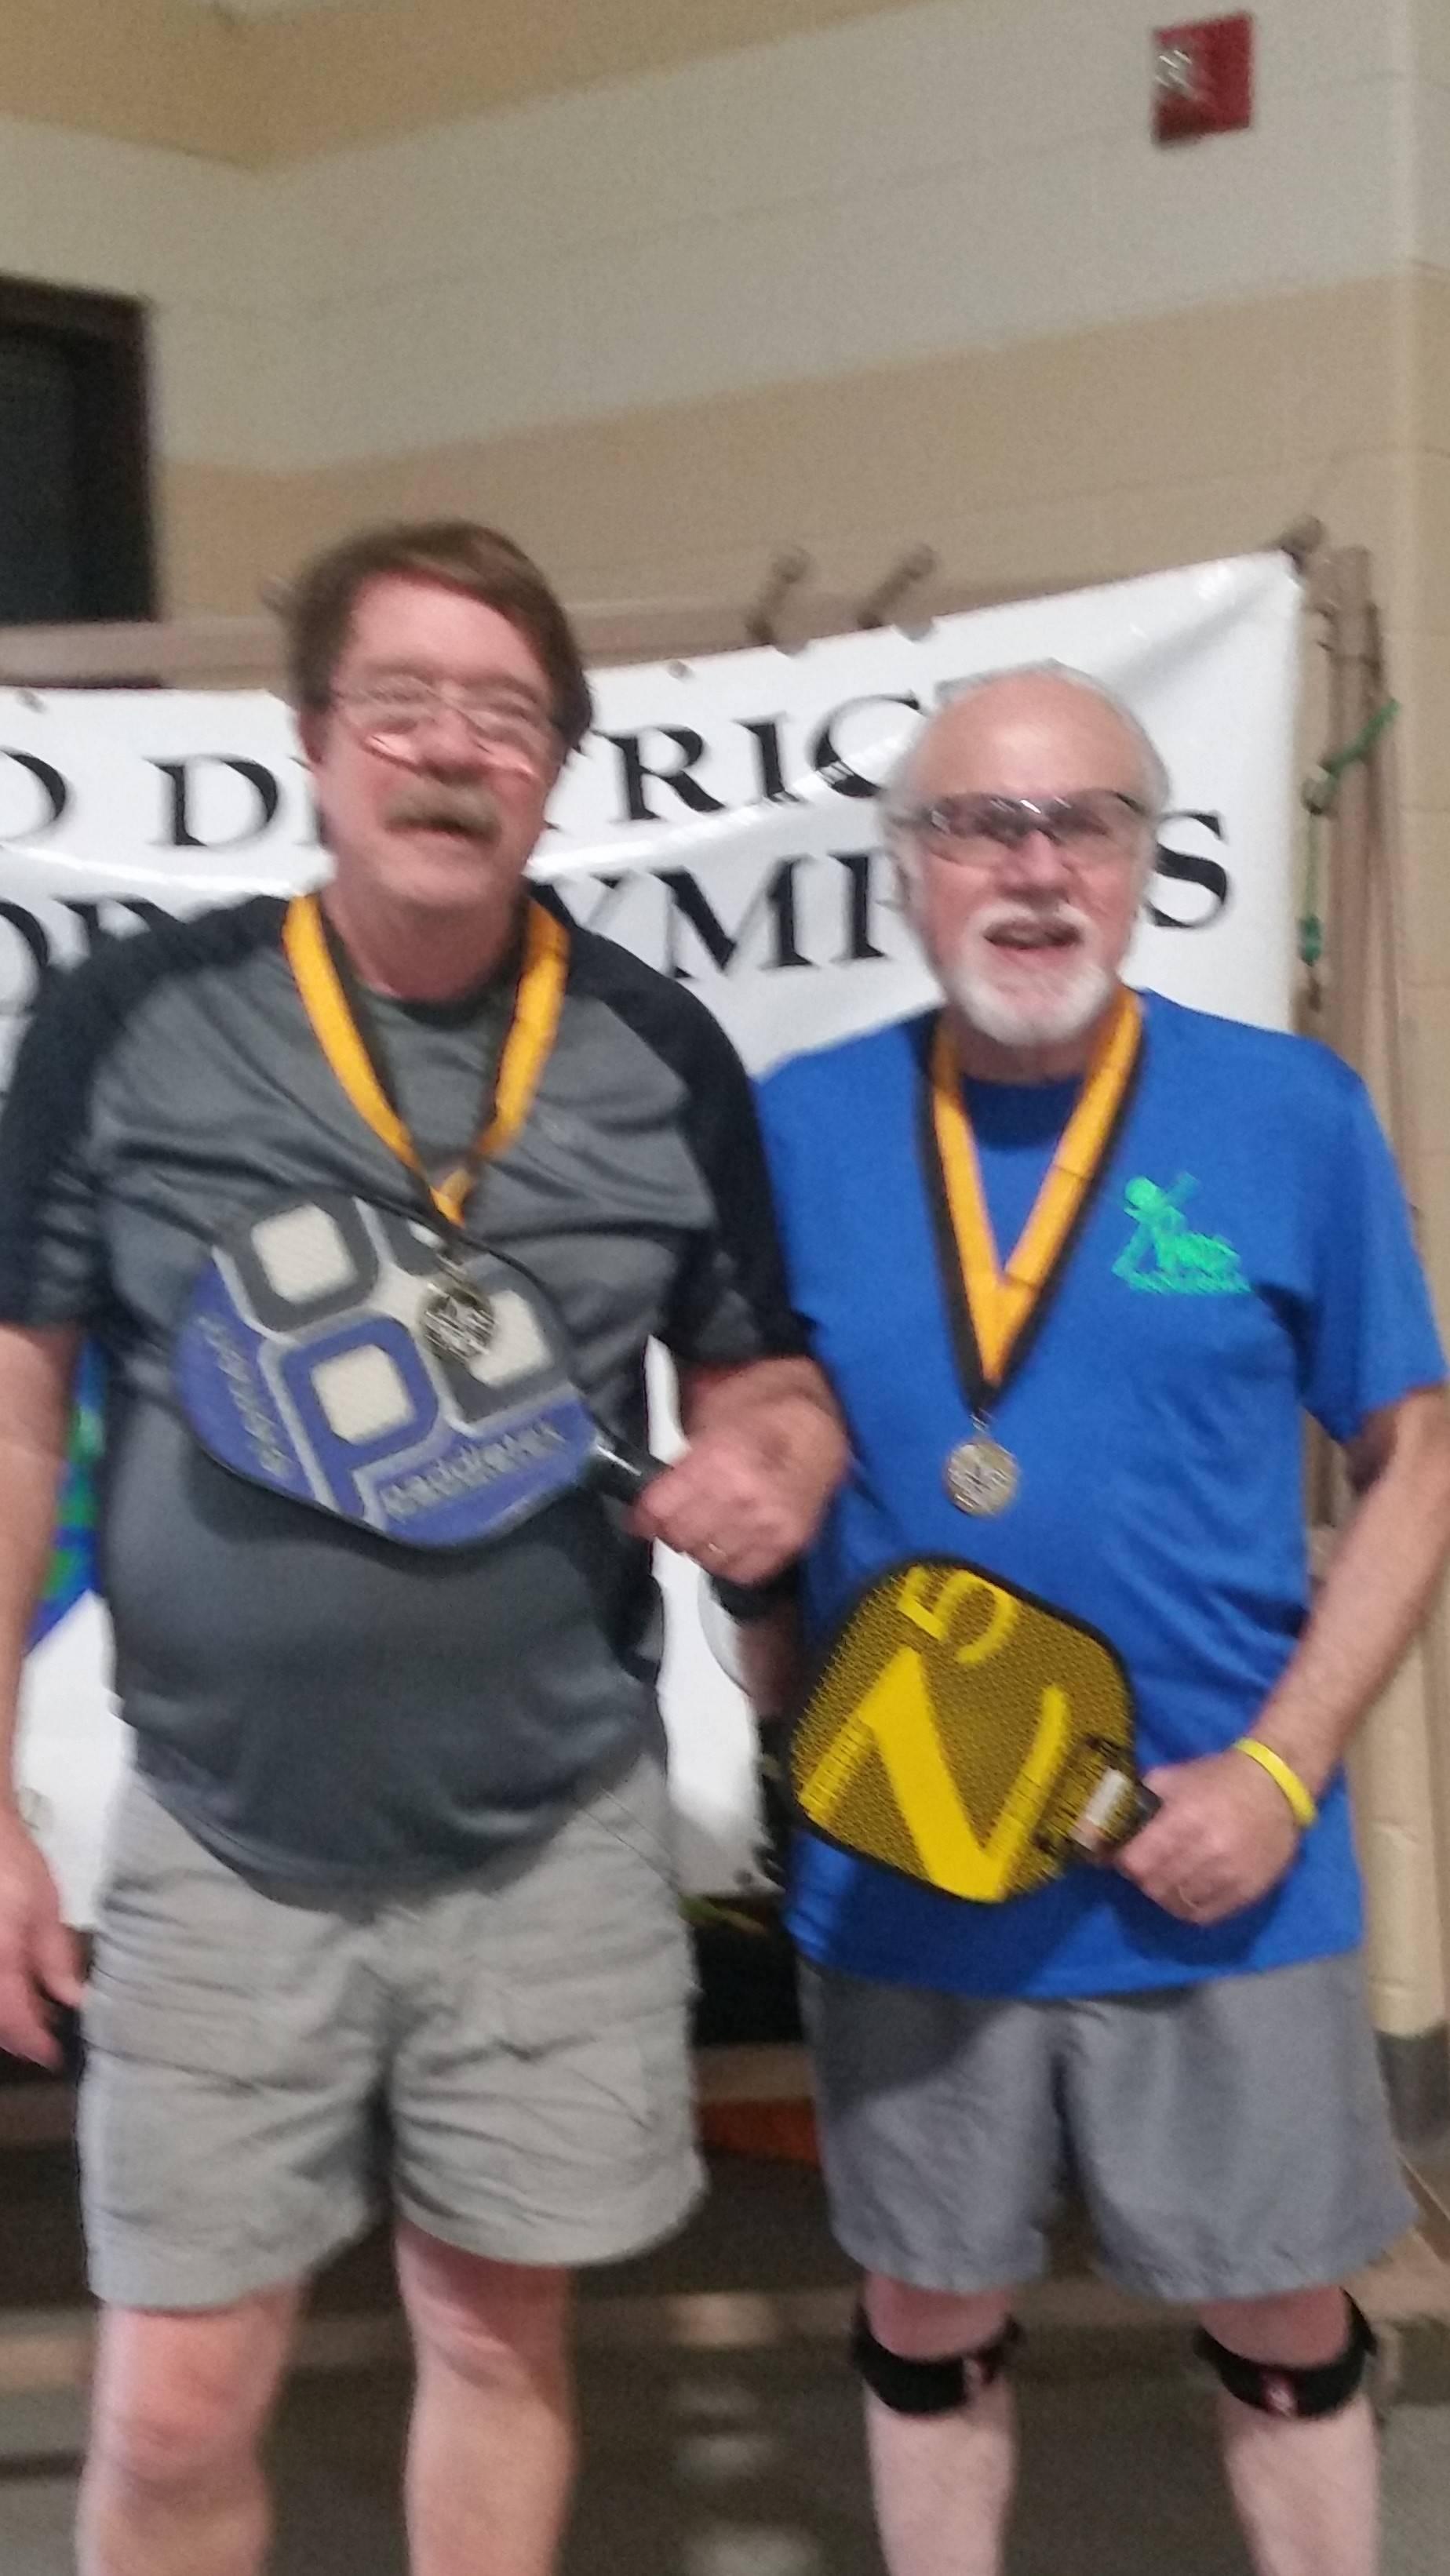 Bruce Brannon and Andrew Menard